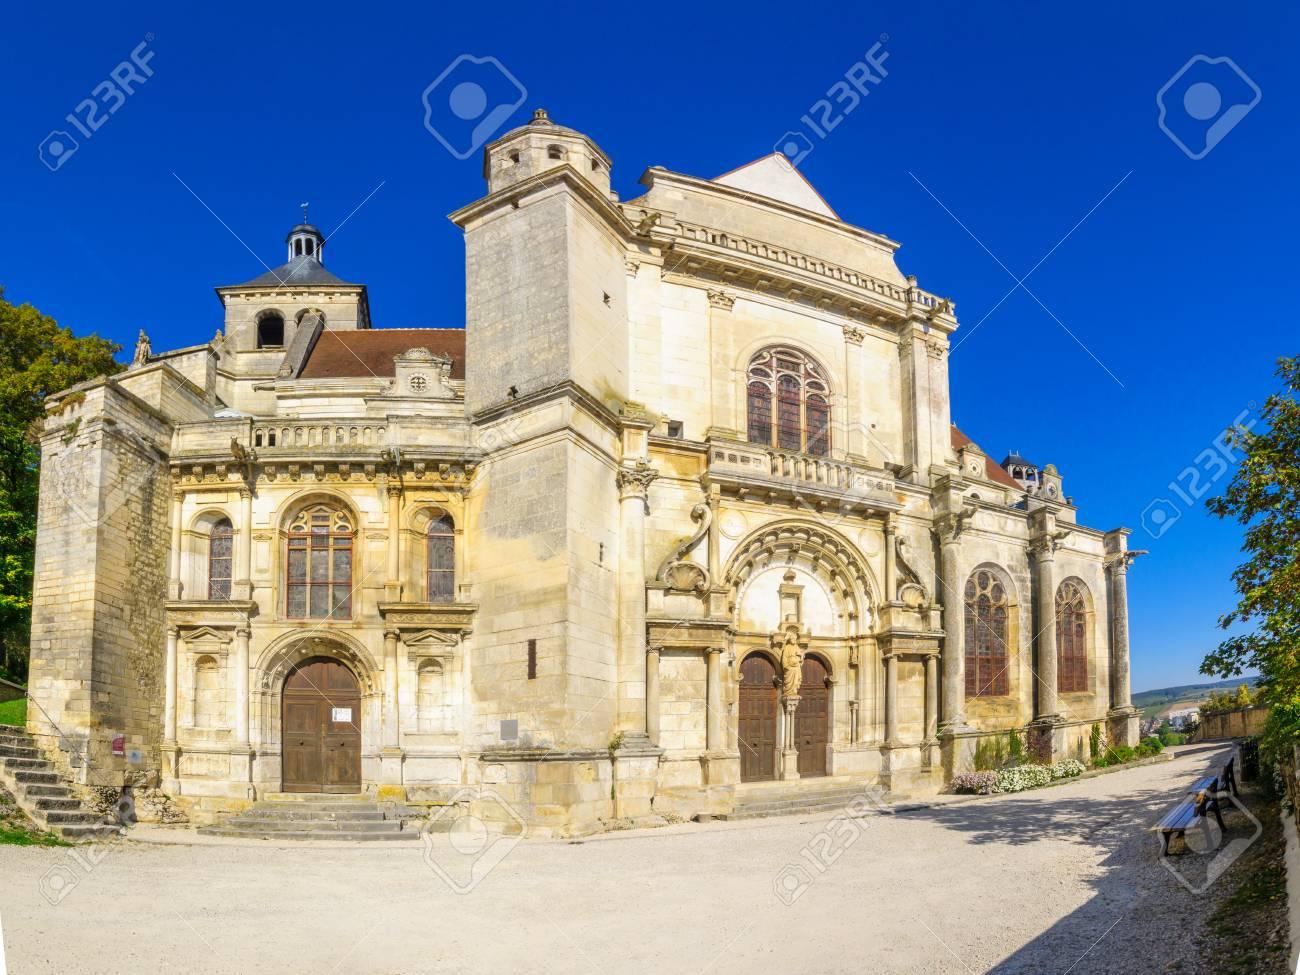 The Saint Peter church, in Tonnerre, Burgundy, France - 67235677